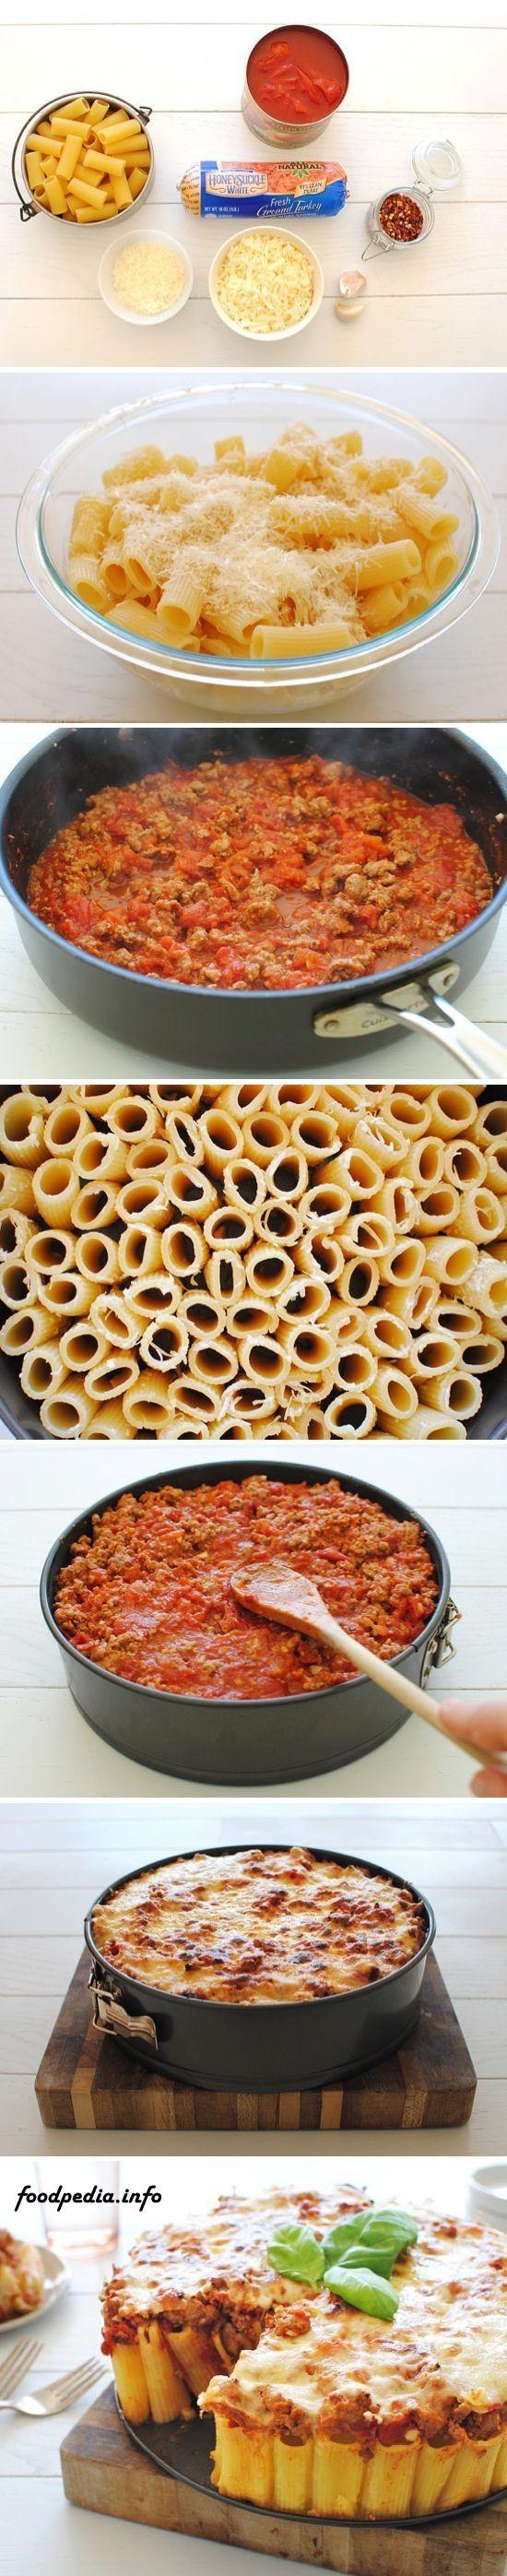 Pasta-Pie-Recipe-By-Photo.jpg 550×2,793 pixels